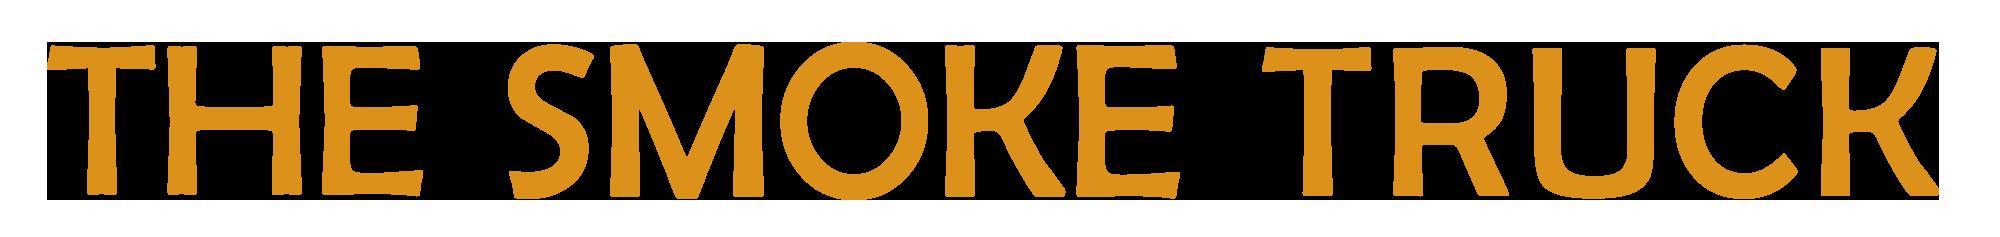 TheSmokeTruck